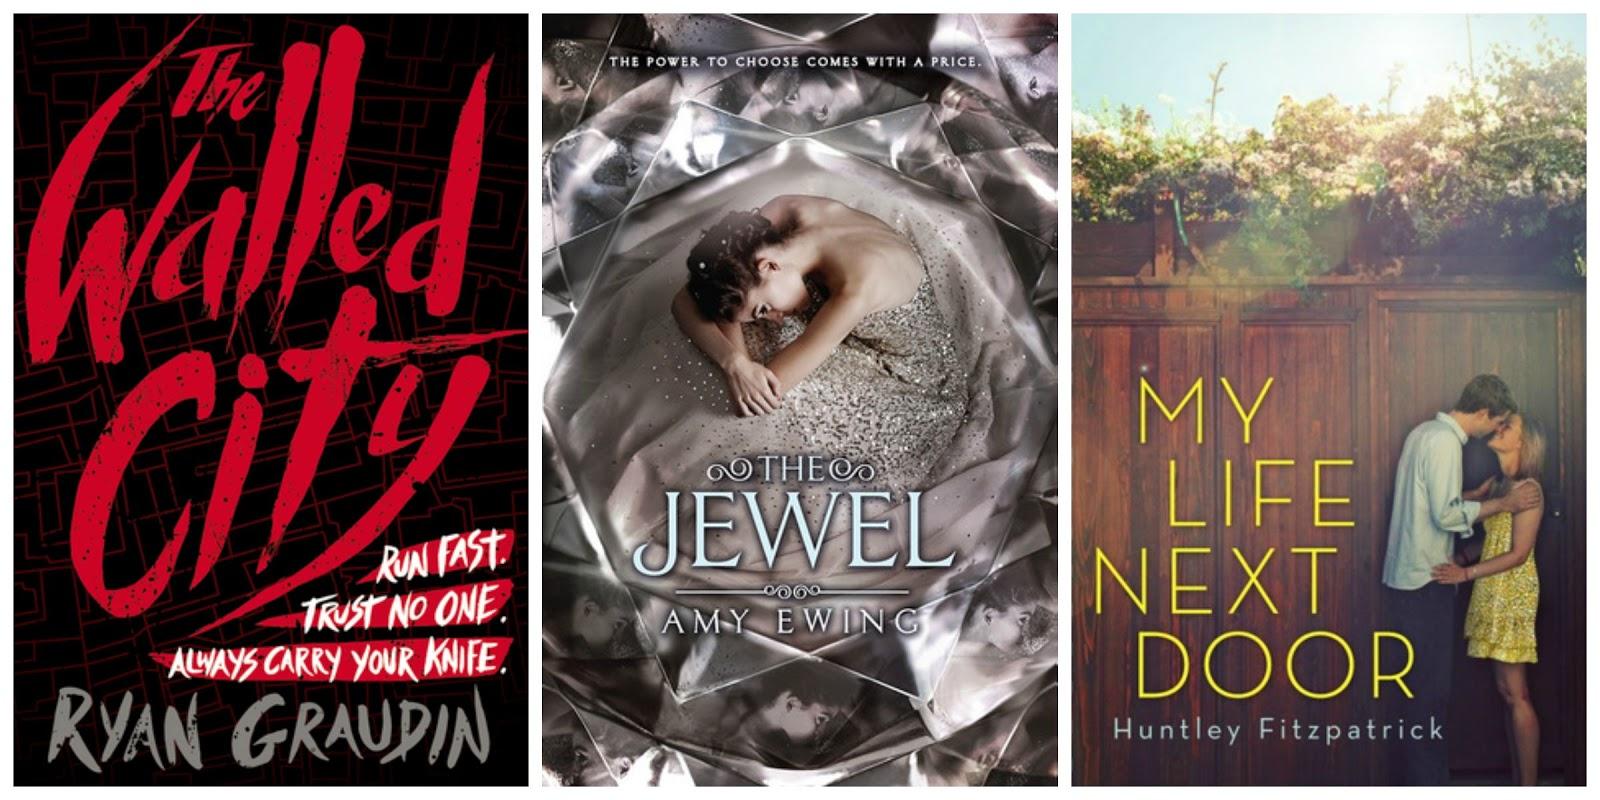 Books by Jay: POPULAR YA BOOKS THAT I WON'T BE READING